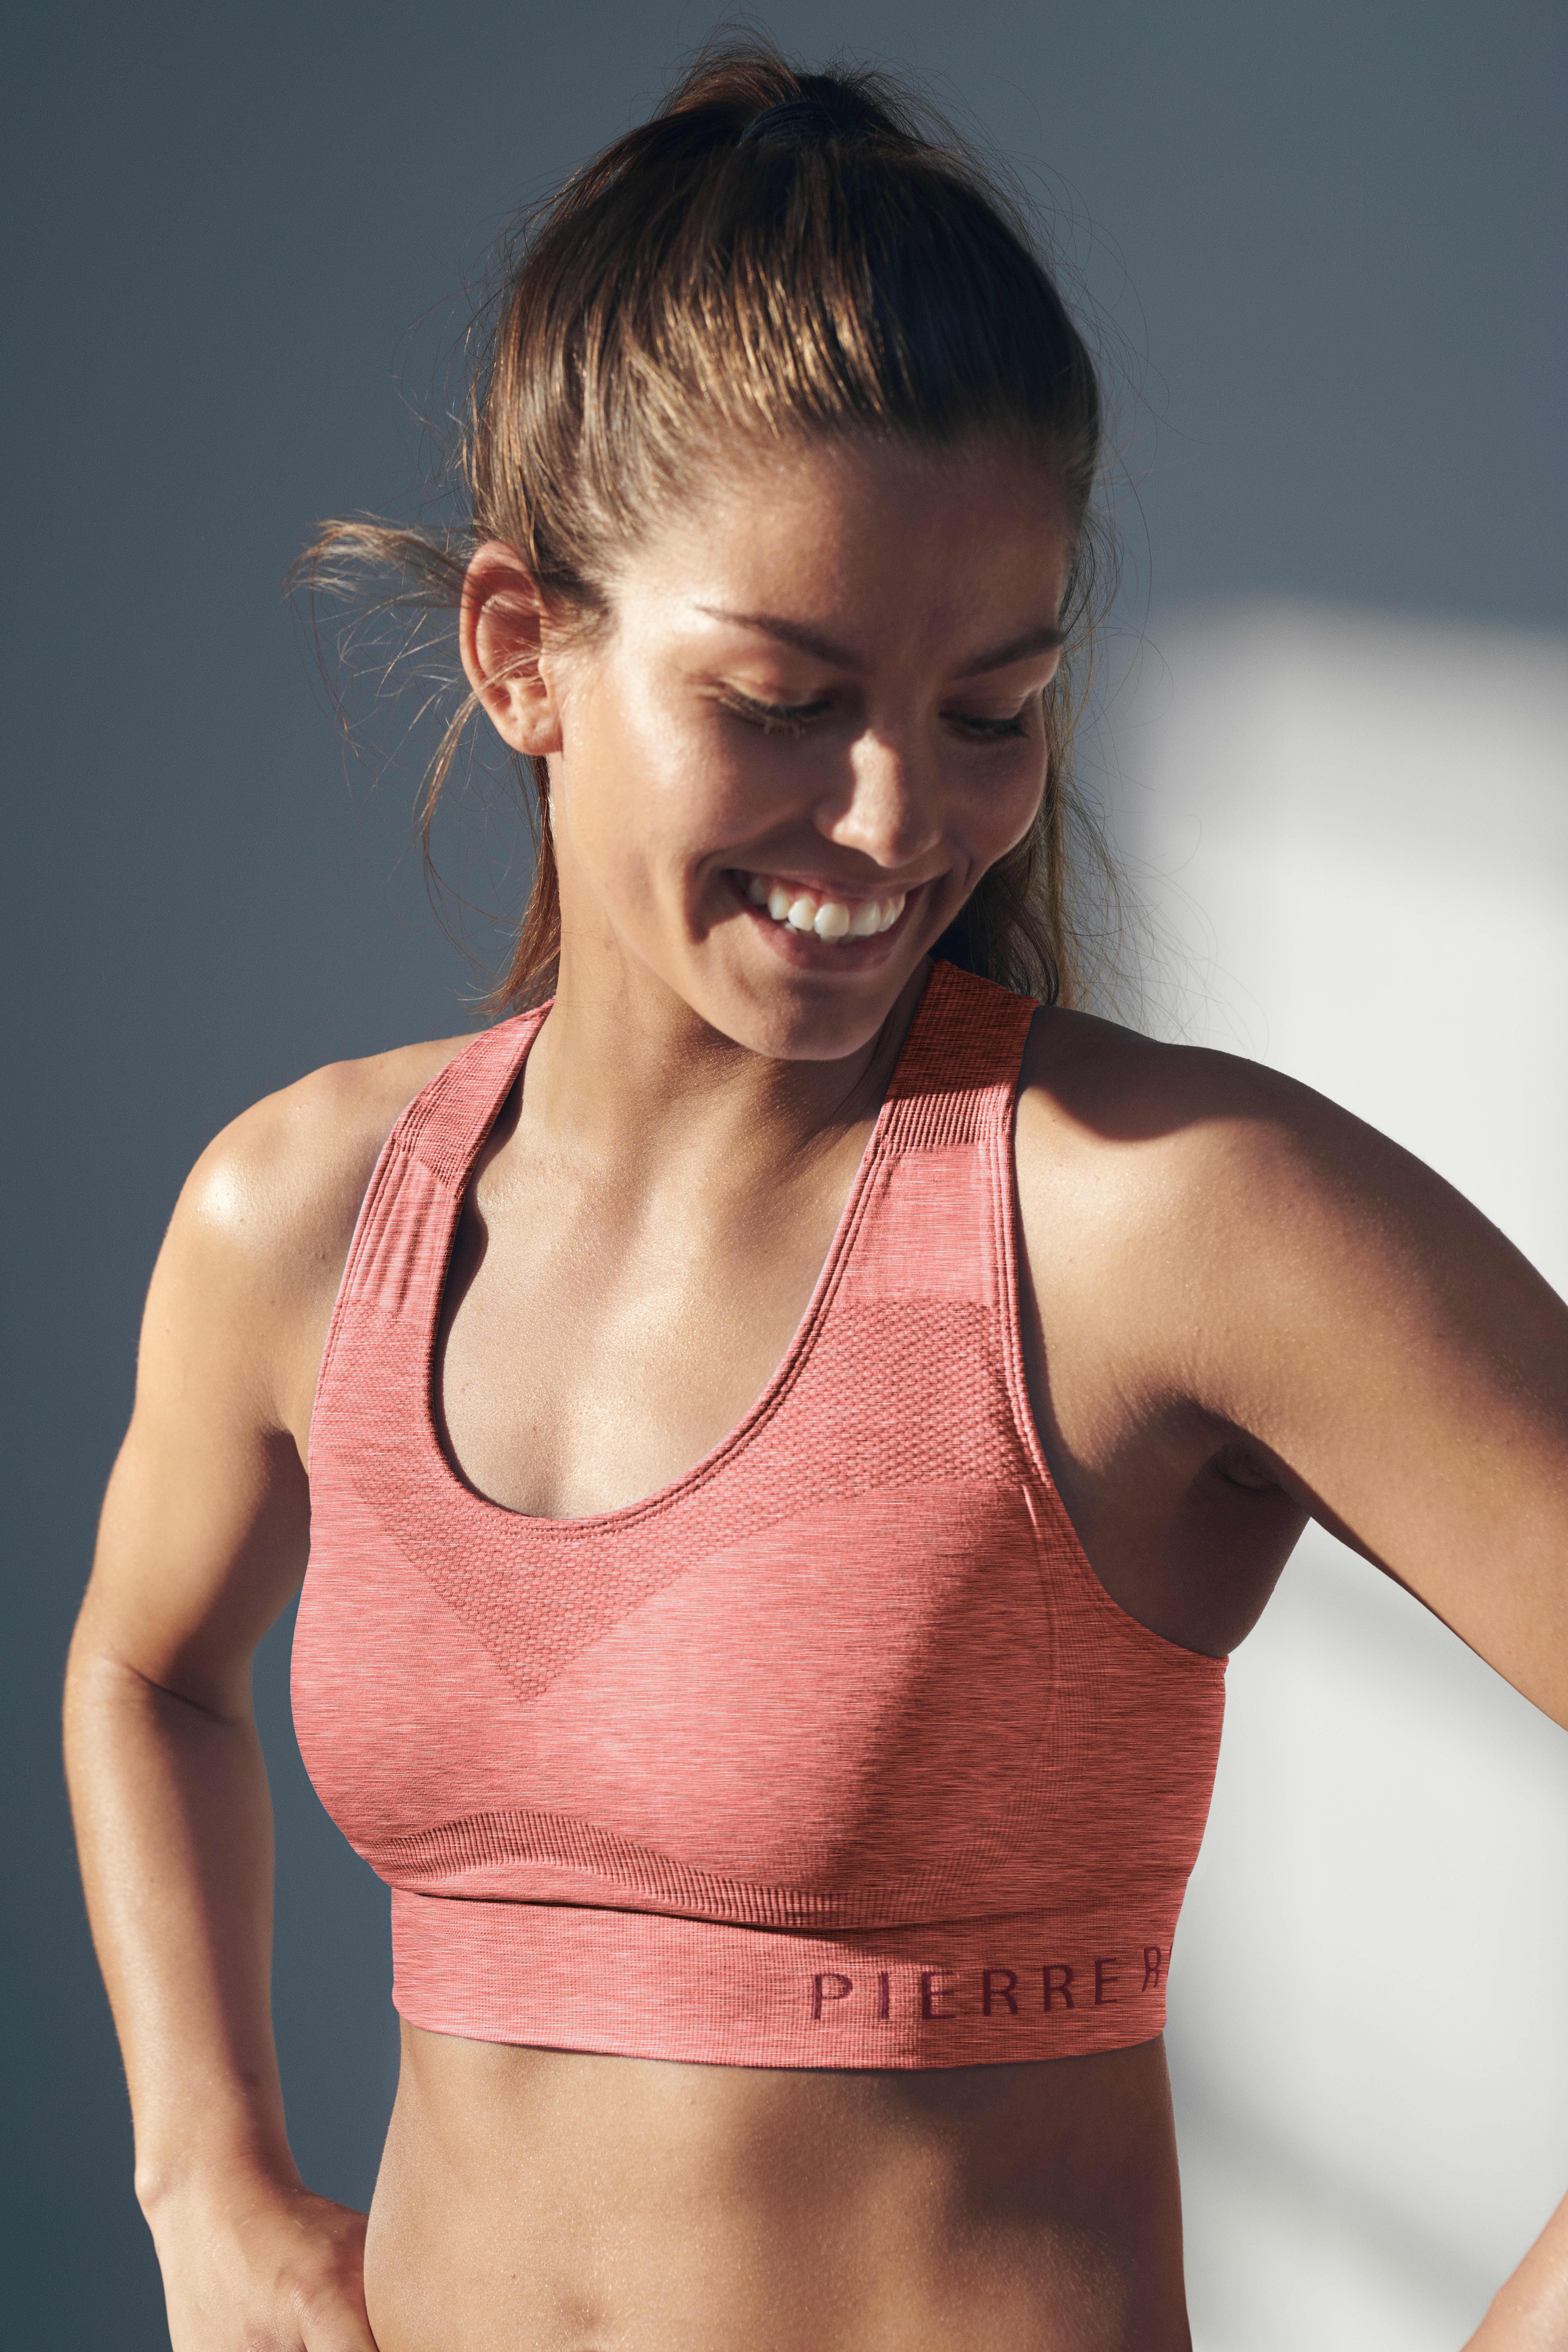 Formstrikkede kopper gir fantastisk komfort og stretch, samtidig som den støtter godt og holder alt på plass.